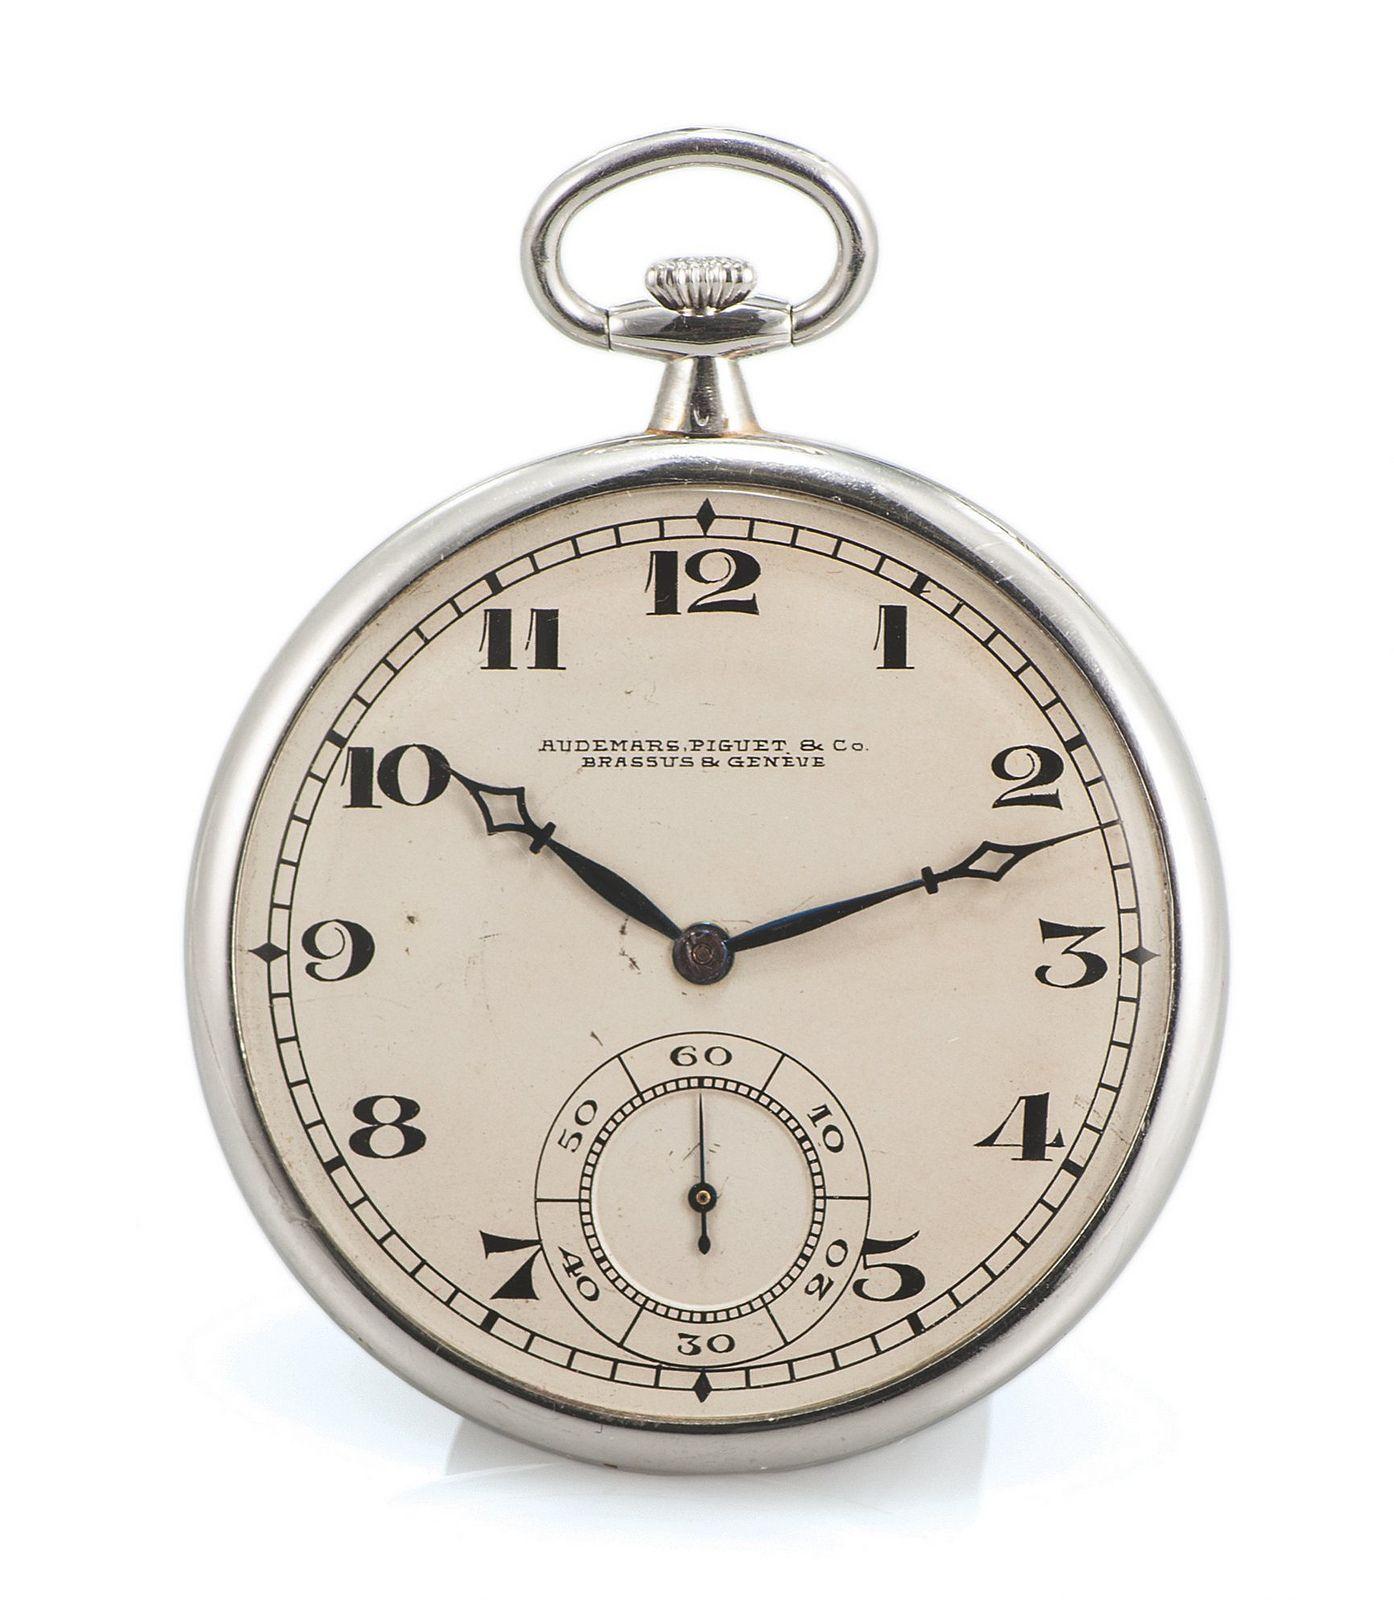 https://flic.kr/p/fznAWB | Audemars Piguet & Co Platinum Pocket Watch 1915